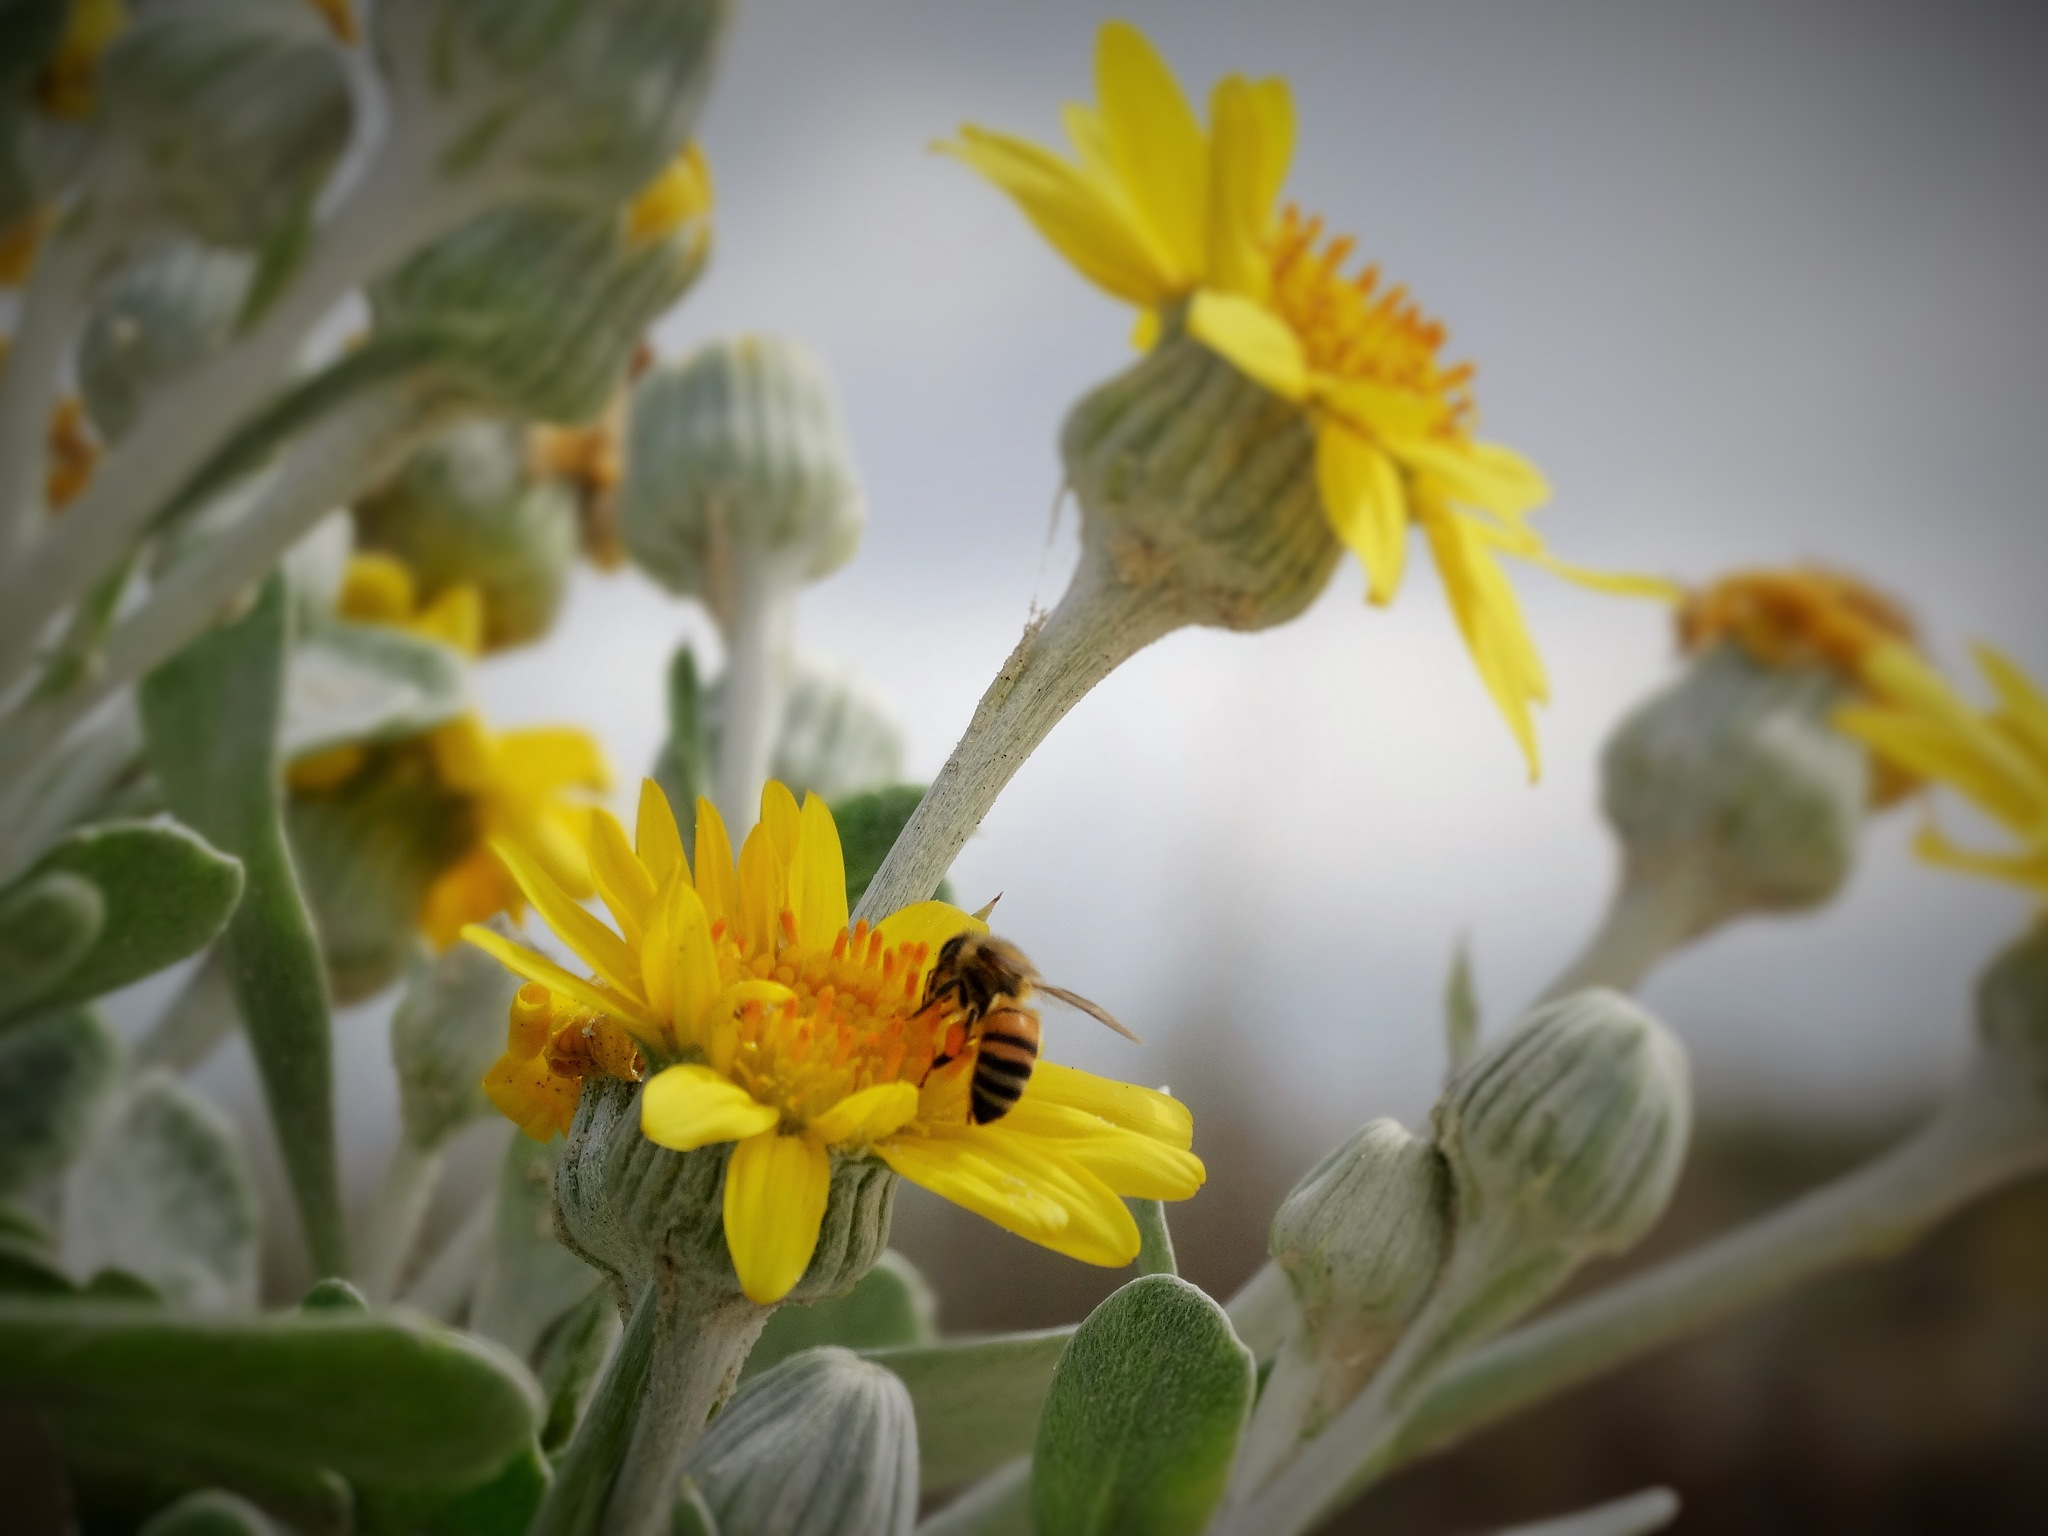 na busca do doce da flor by Maciel Panisson